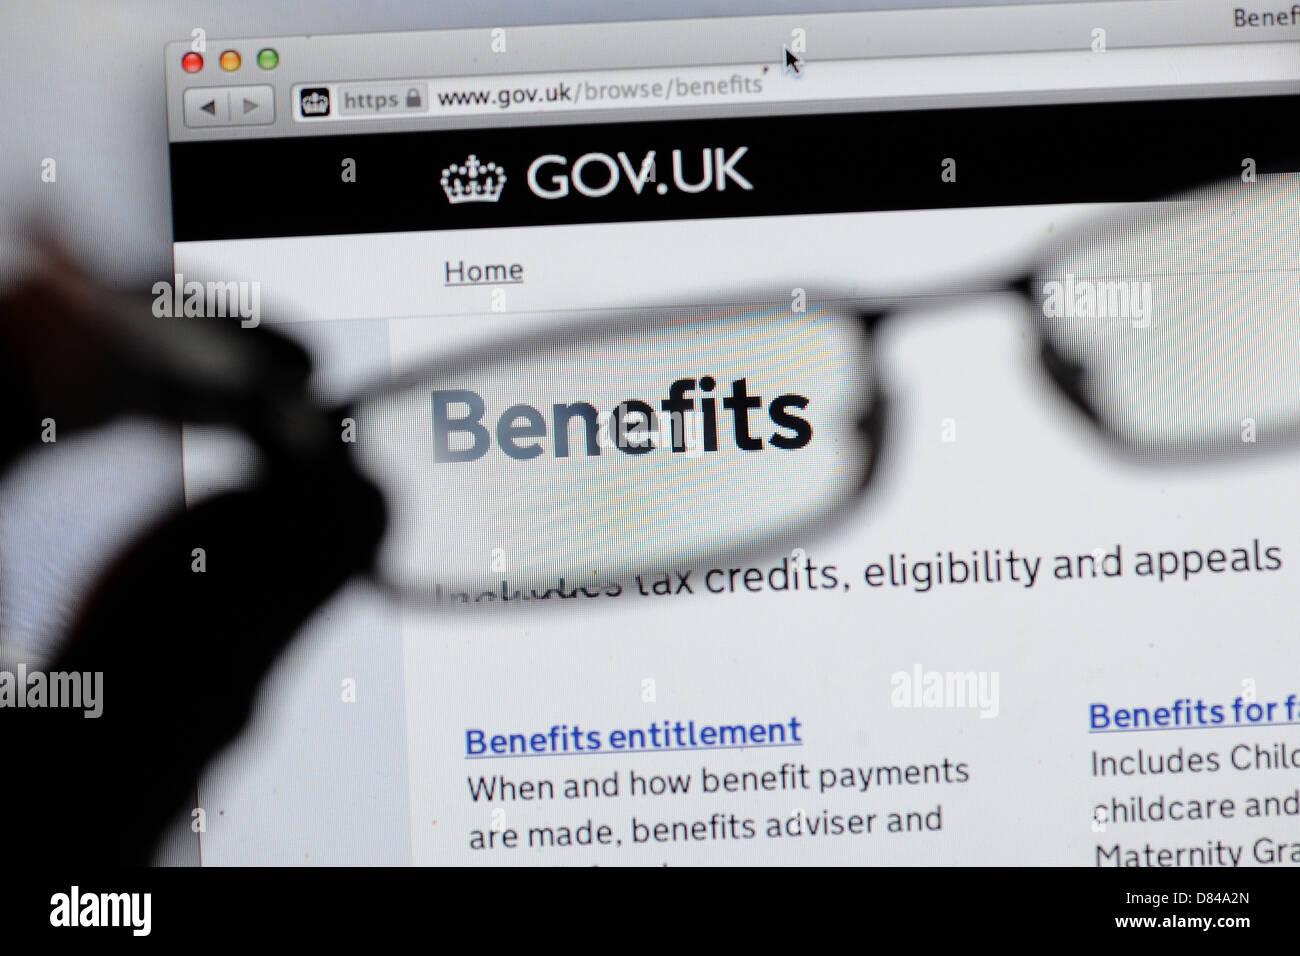 UK benefits website gov.uk - Stock Image